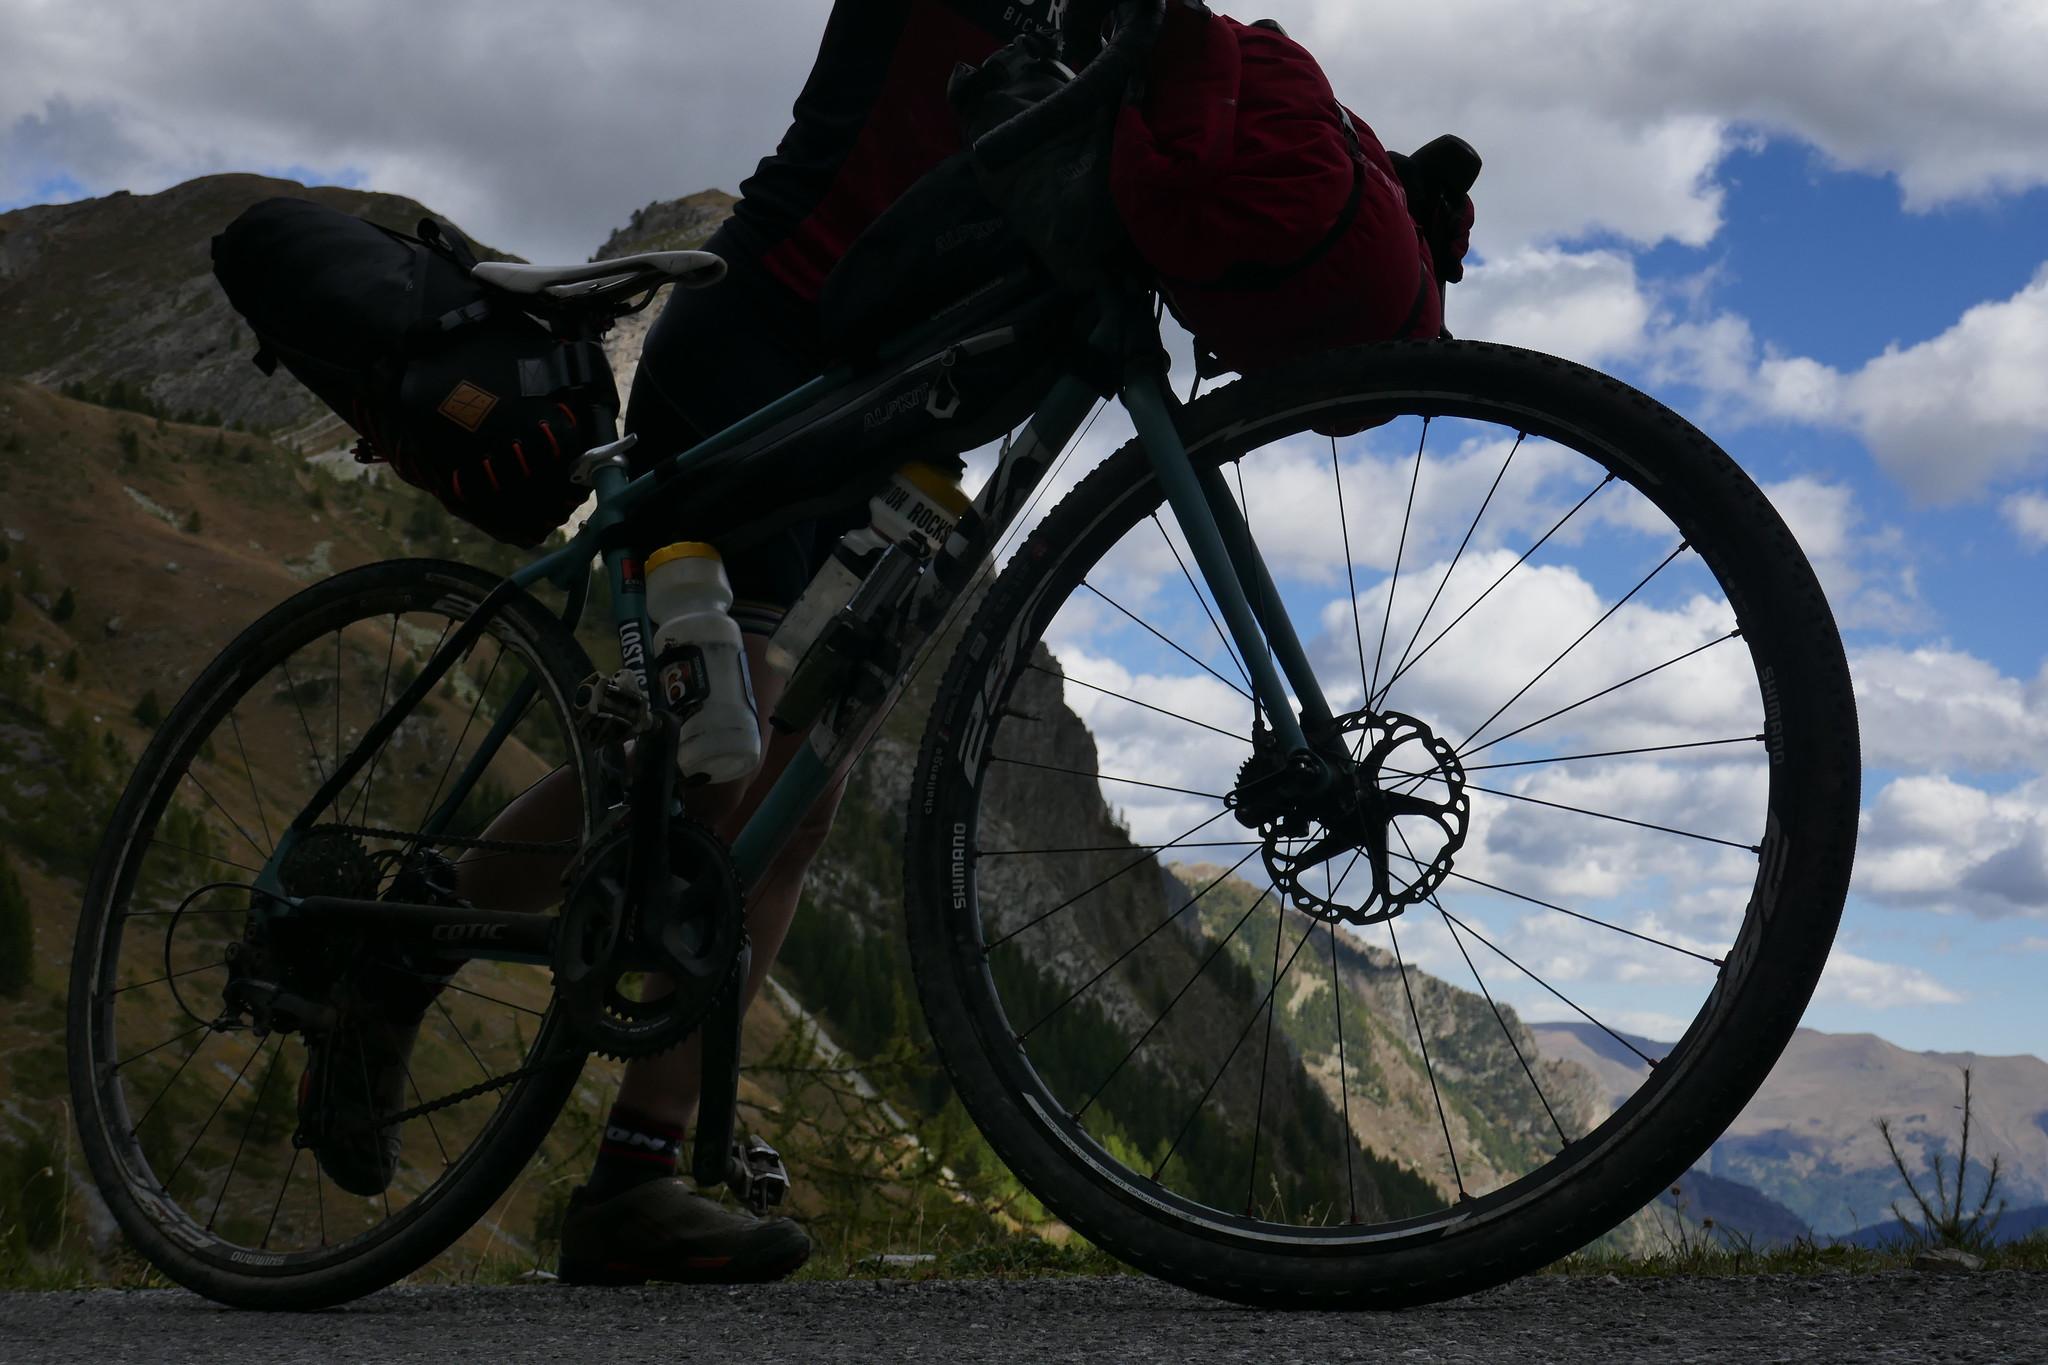 It wasn't all pedalling